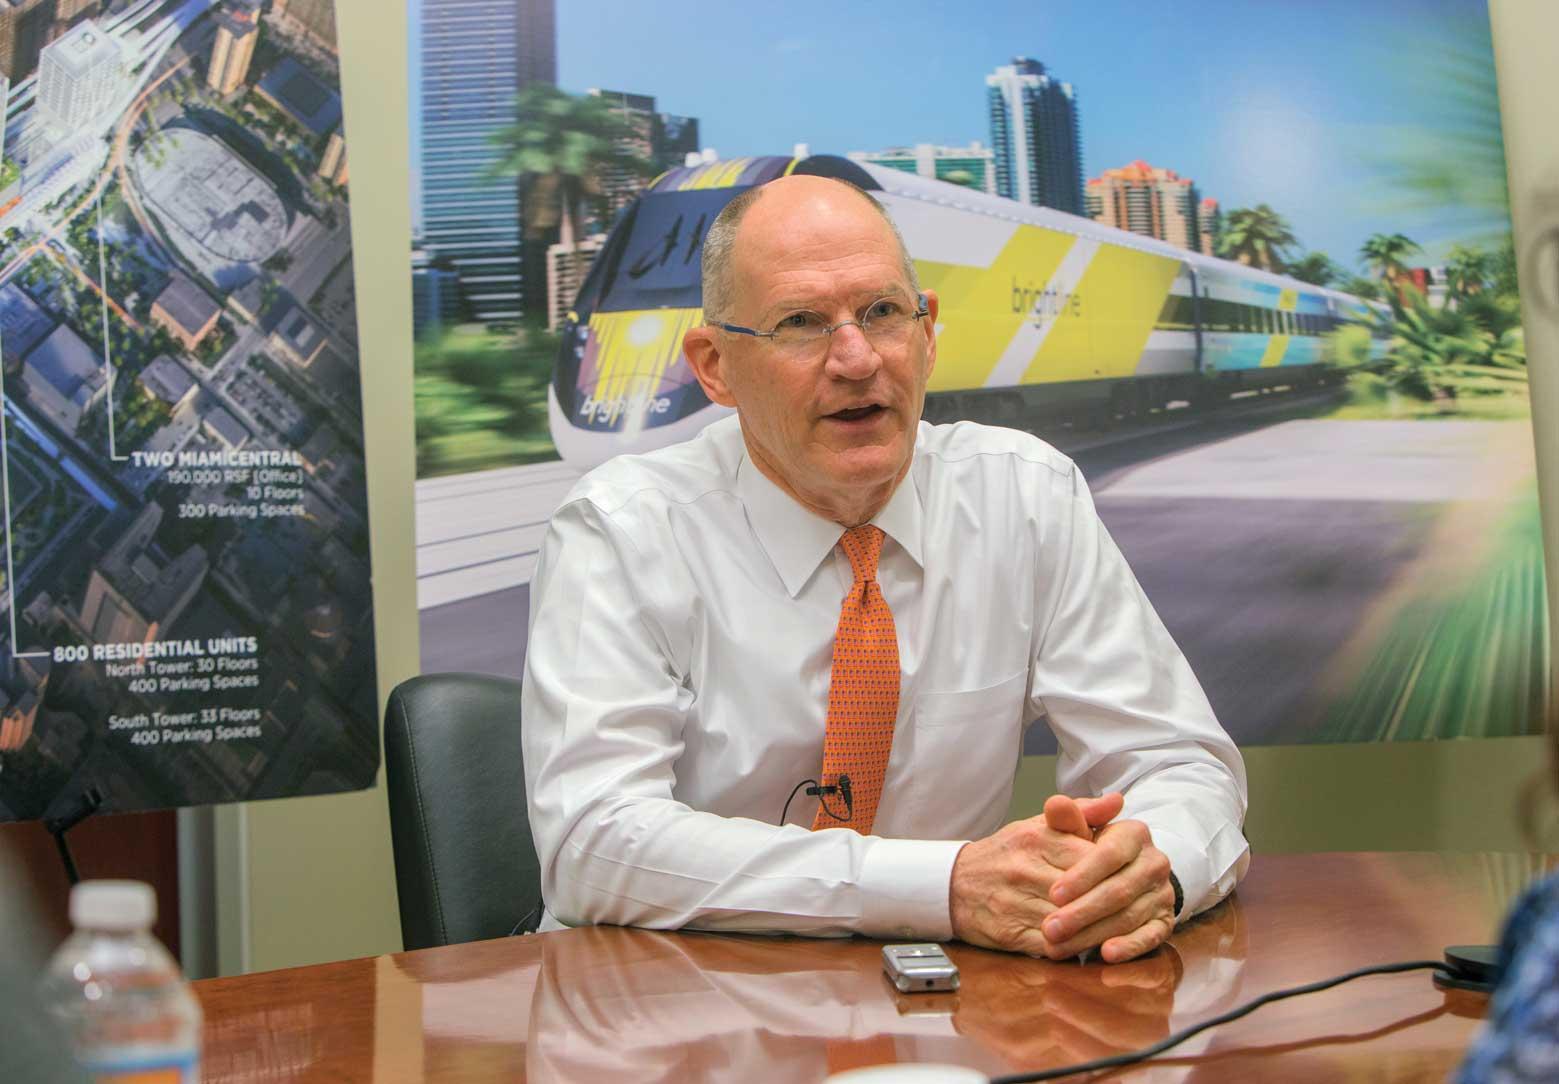 Public-private partnerships for transit get rail developer's input